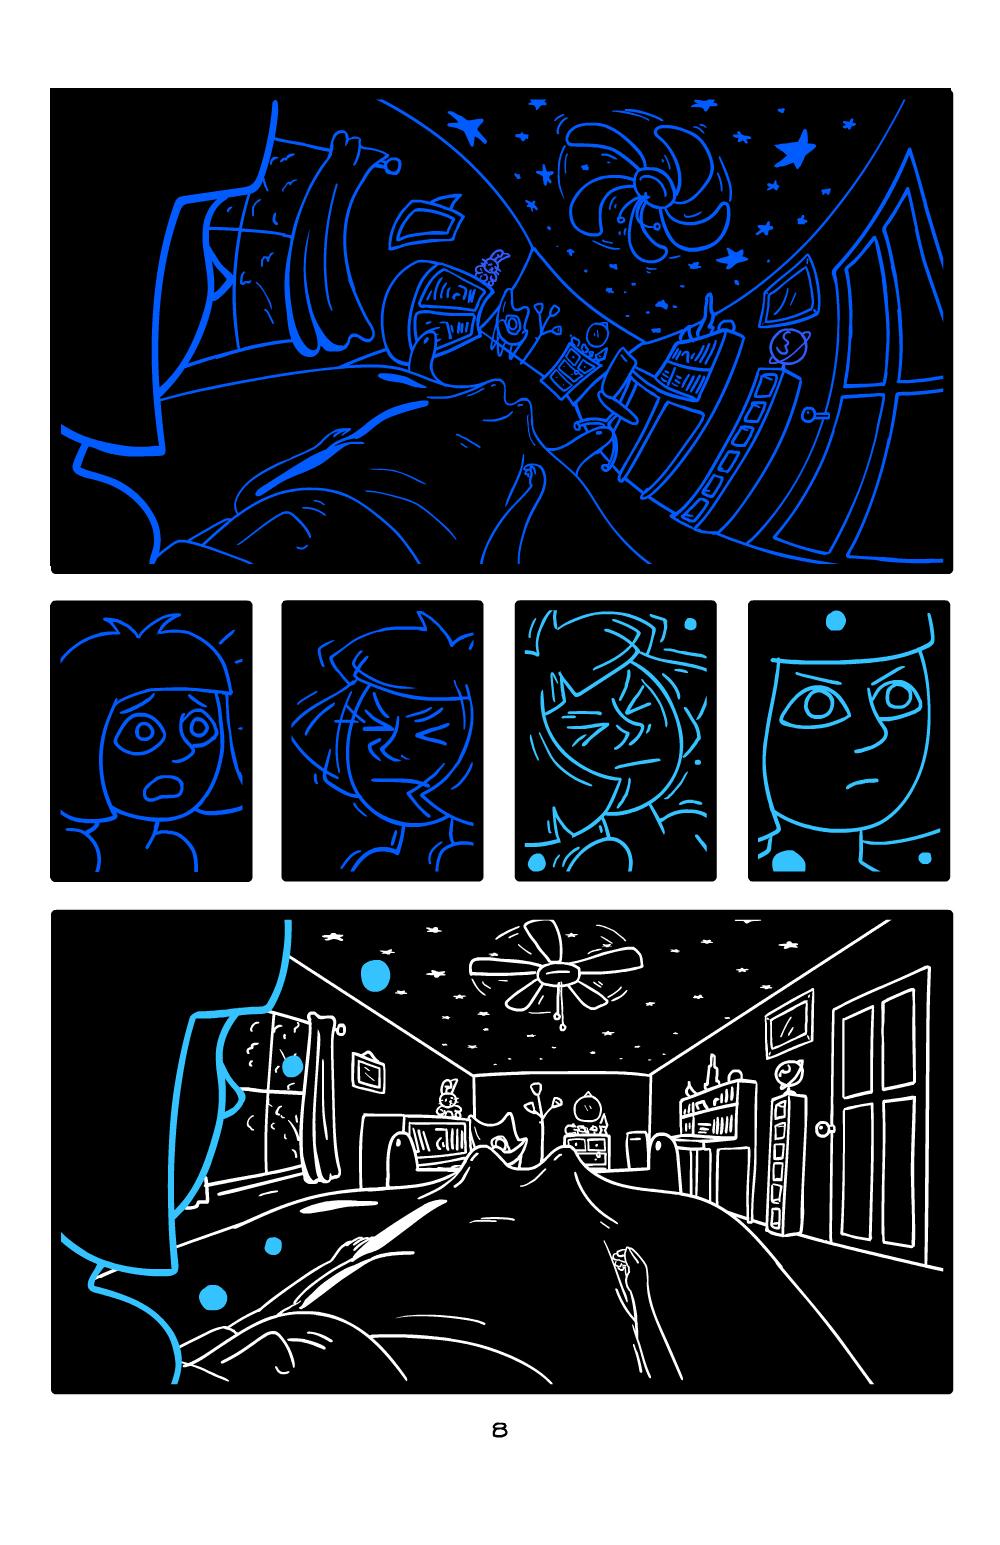 The-Body-Sleeps-9-15-08.jpg